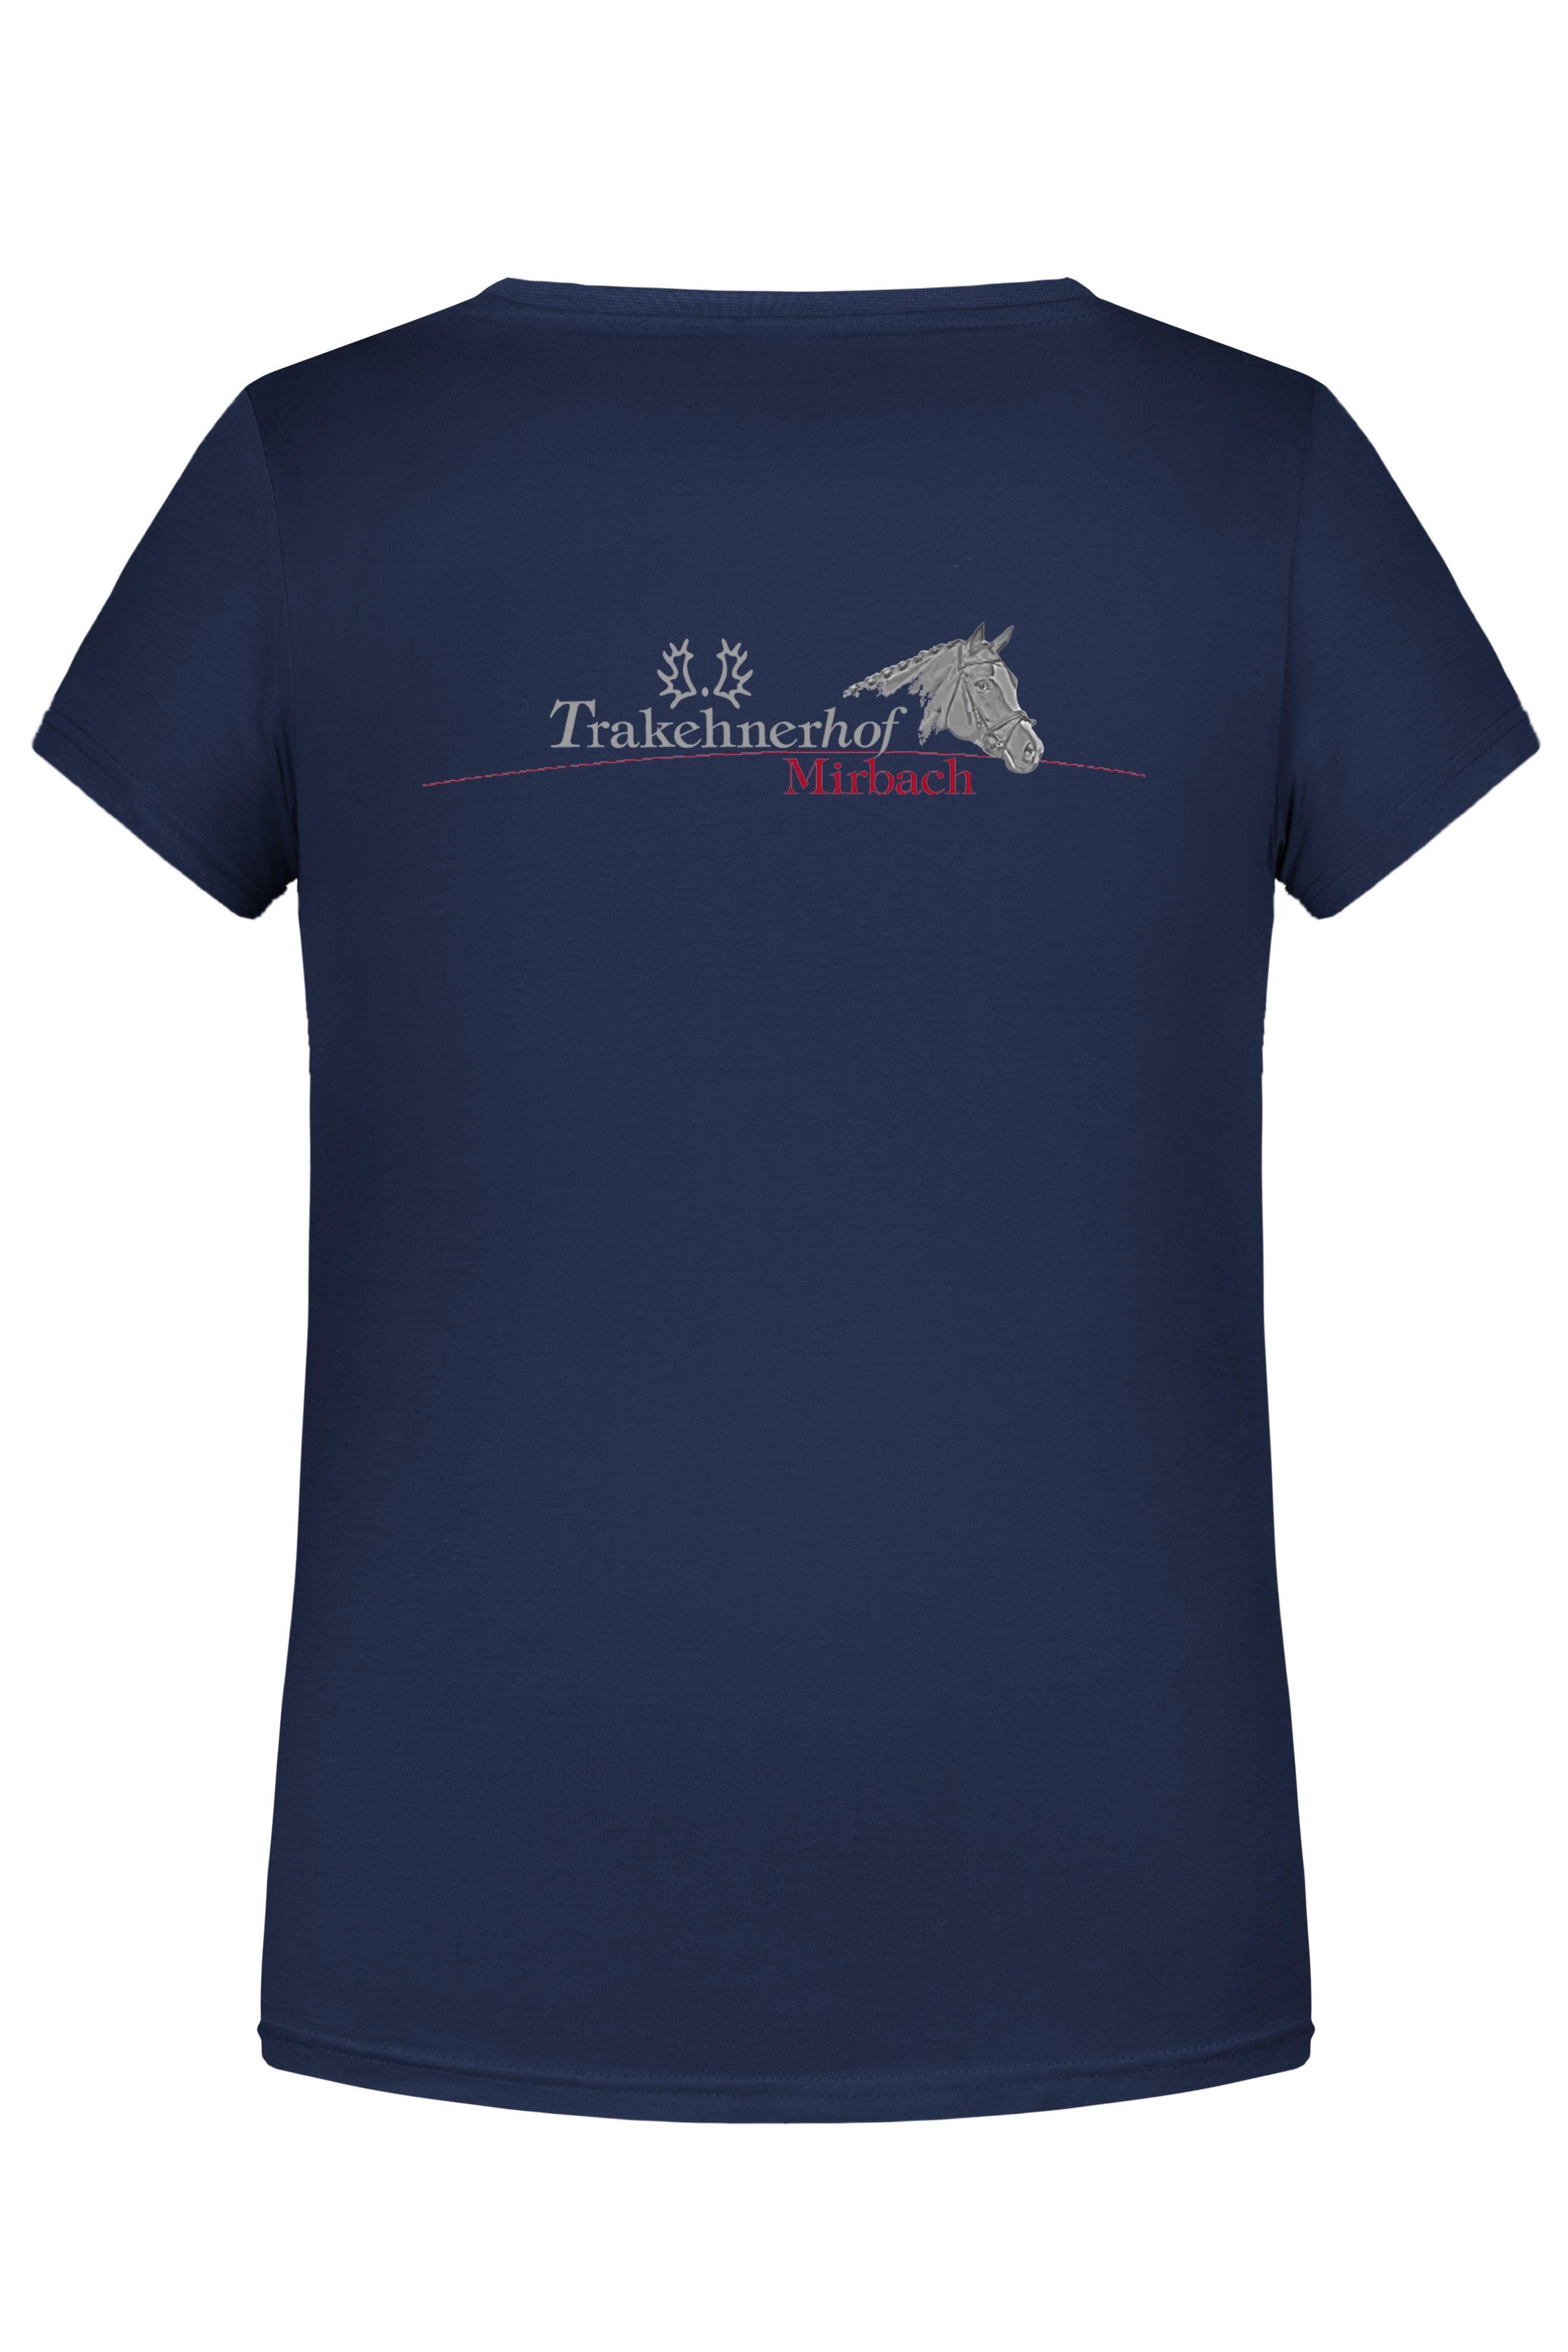 T-Shirt Kinder-navy